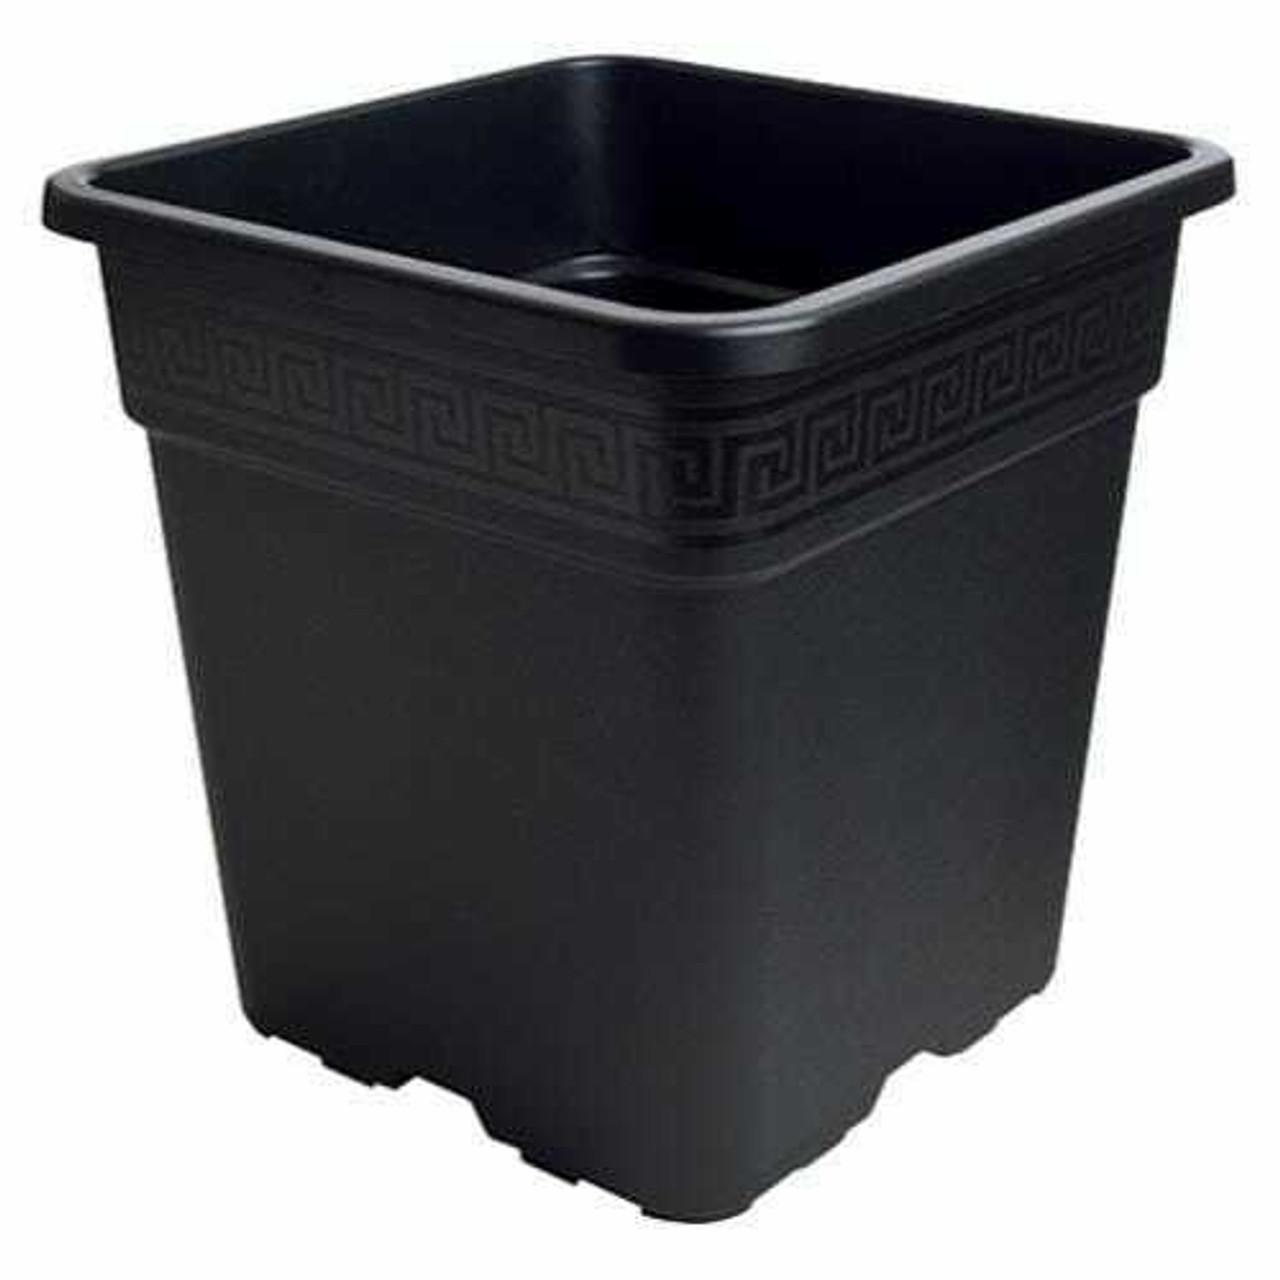 Gro Pro Black Square Pot 5 Gallon